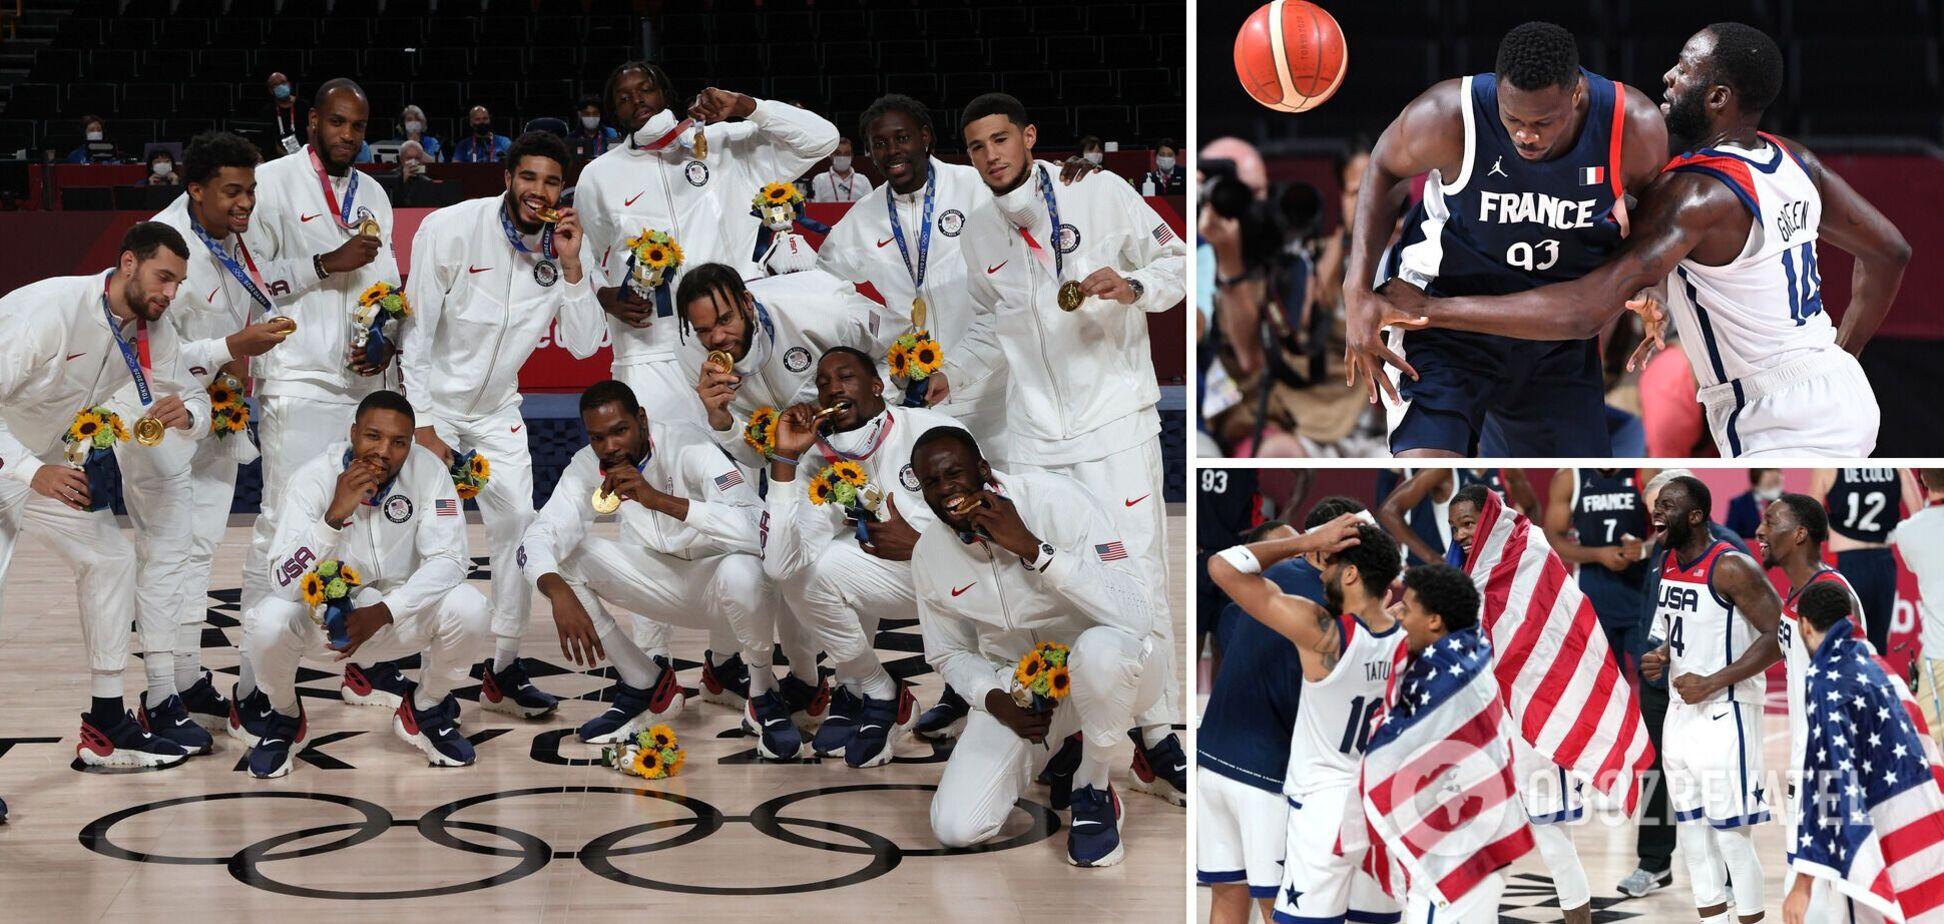 Збірна США з баскетболу